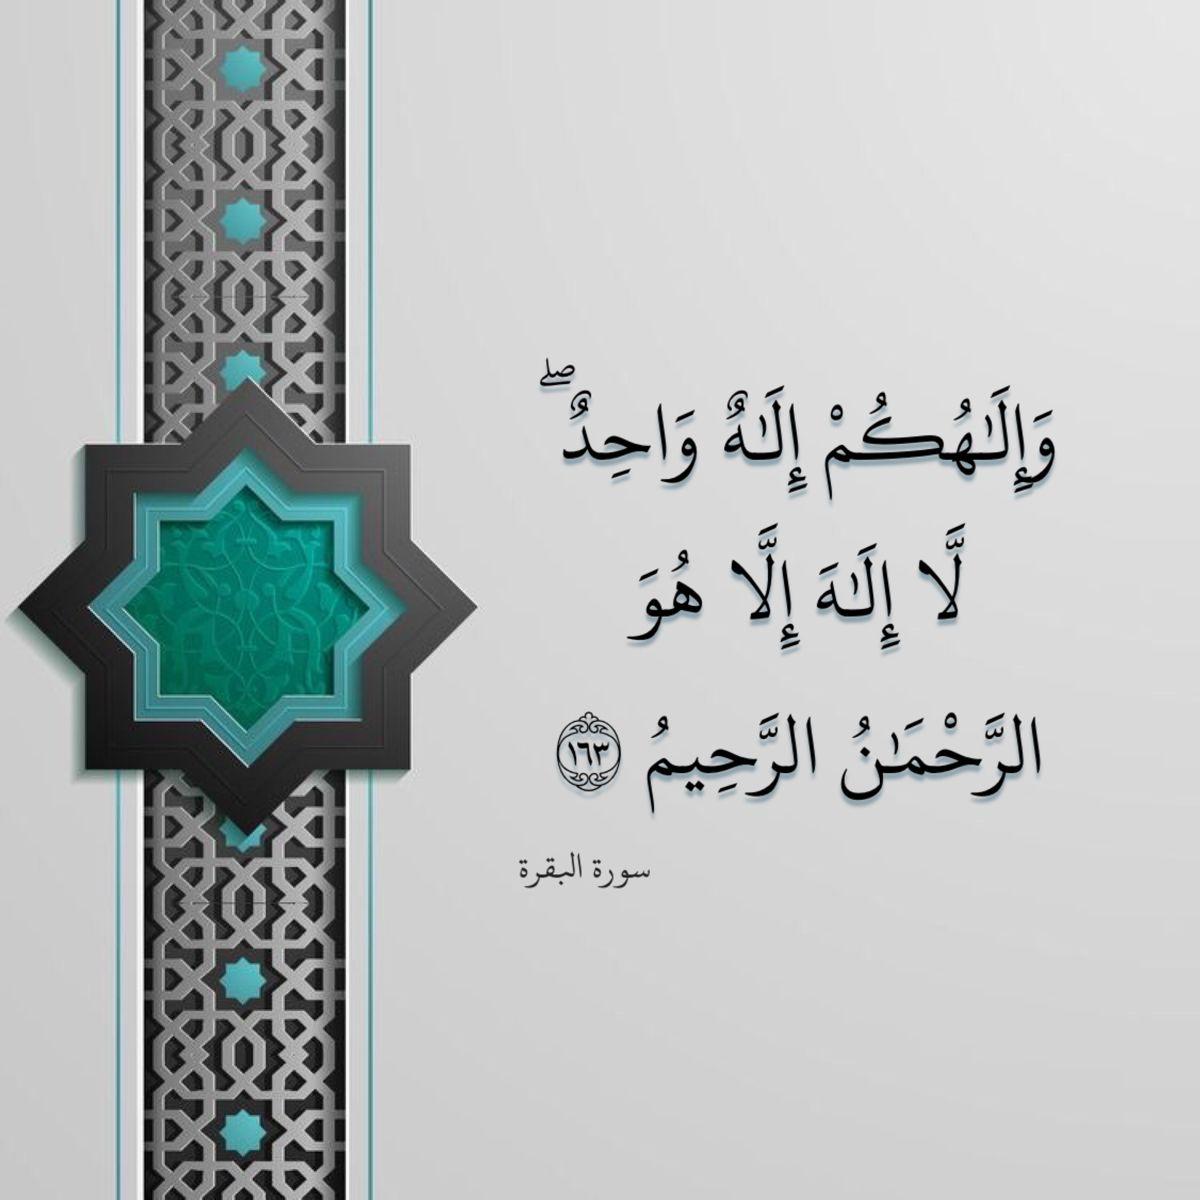 و إ ل ه ك م إ ل ه و اح د ل ا إ ل ه إ ل ا ه و الر ح م ن الر ح يم Islamic Wallpaper Peace Symbol Symbols